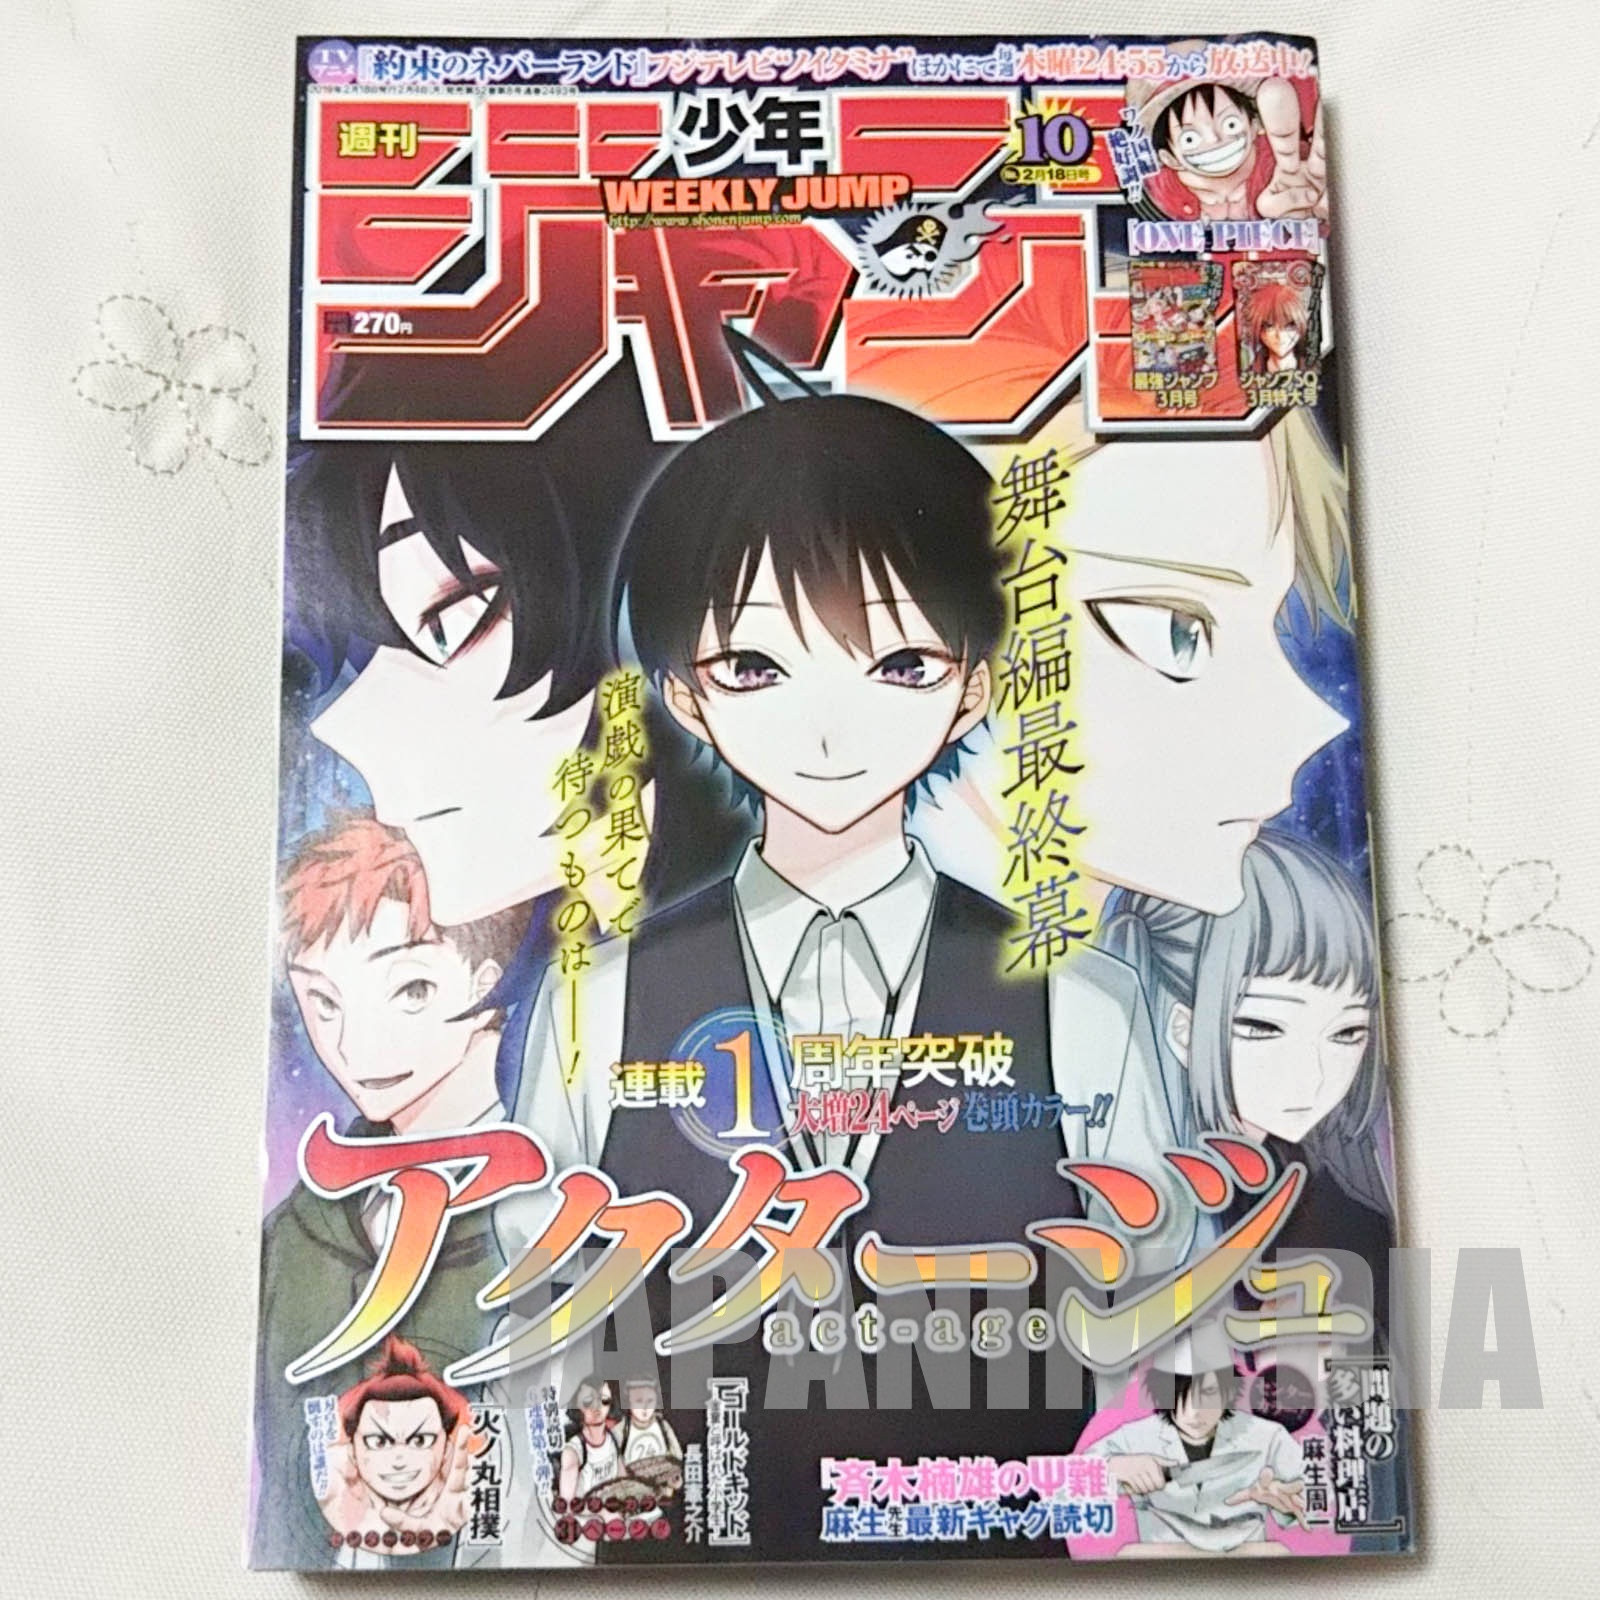 Weekly Shonen JUMP  Vol.10 2019 Act-age / Japanese Magazine JAPAN MANGA